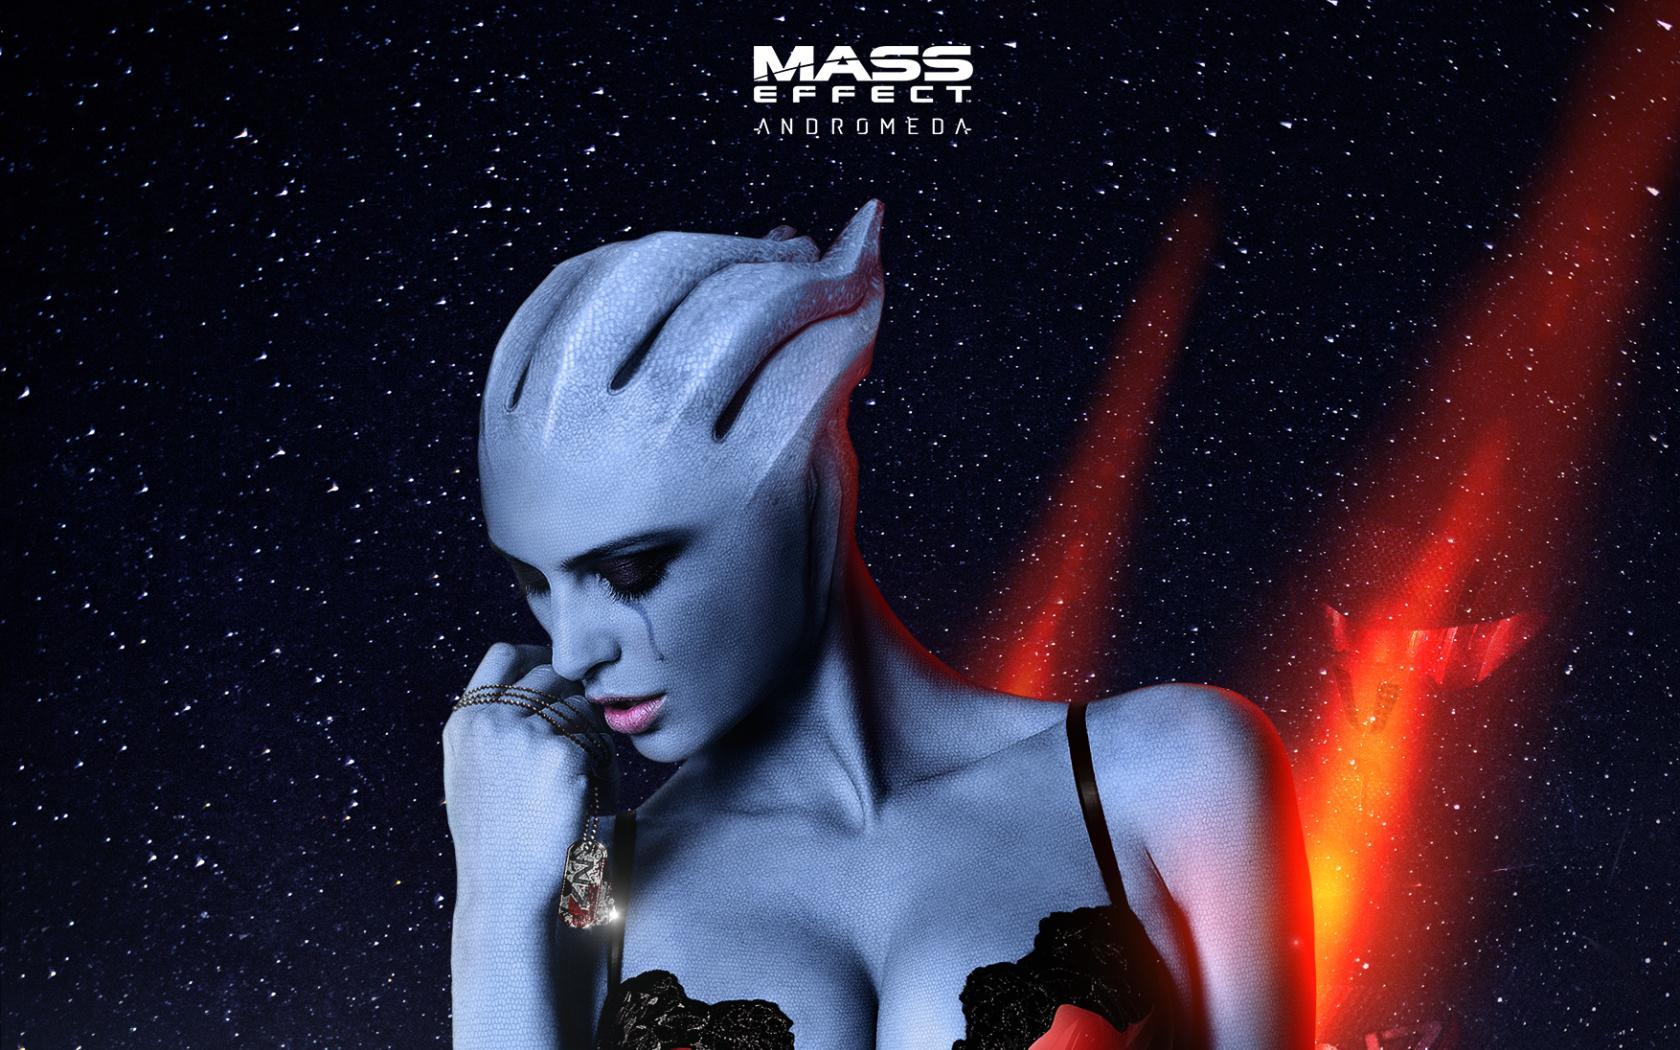 Heroes Fall Mass Effect Andromeda Mass Effect Andromeda Wall Paper 1680x1050 Download Hd Wallpaper Wallpapertip